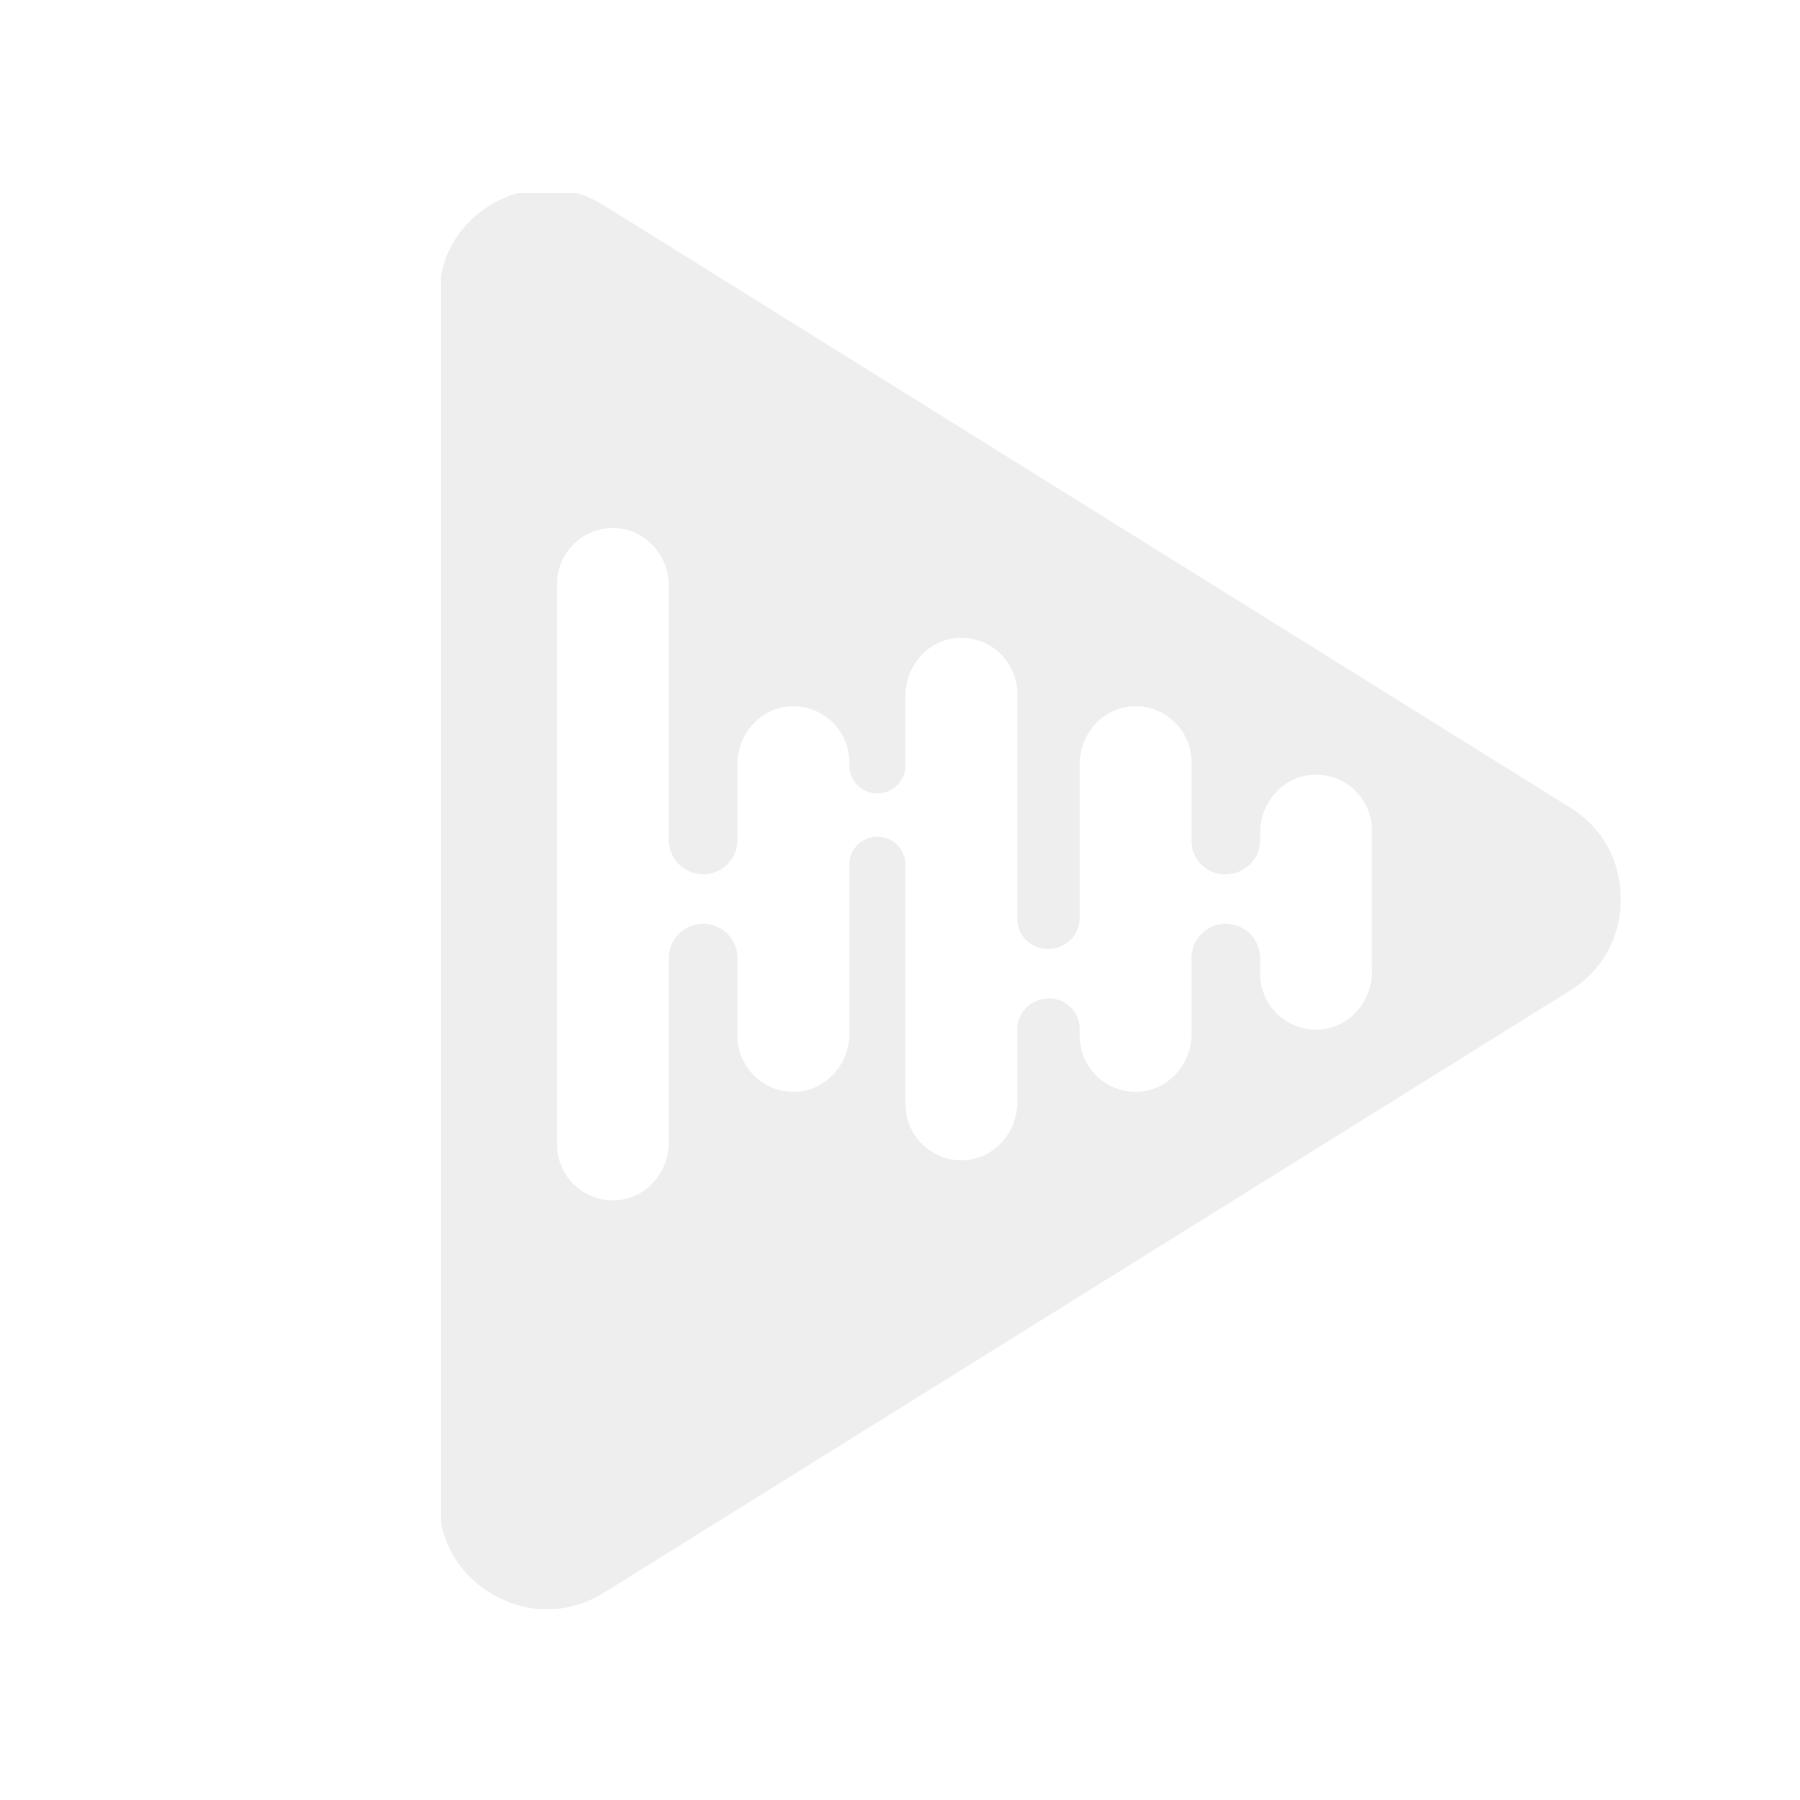 Grandview 148639 - Lerret Cyber, 16:9, 294x165, Manuelt 133